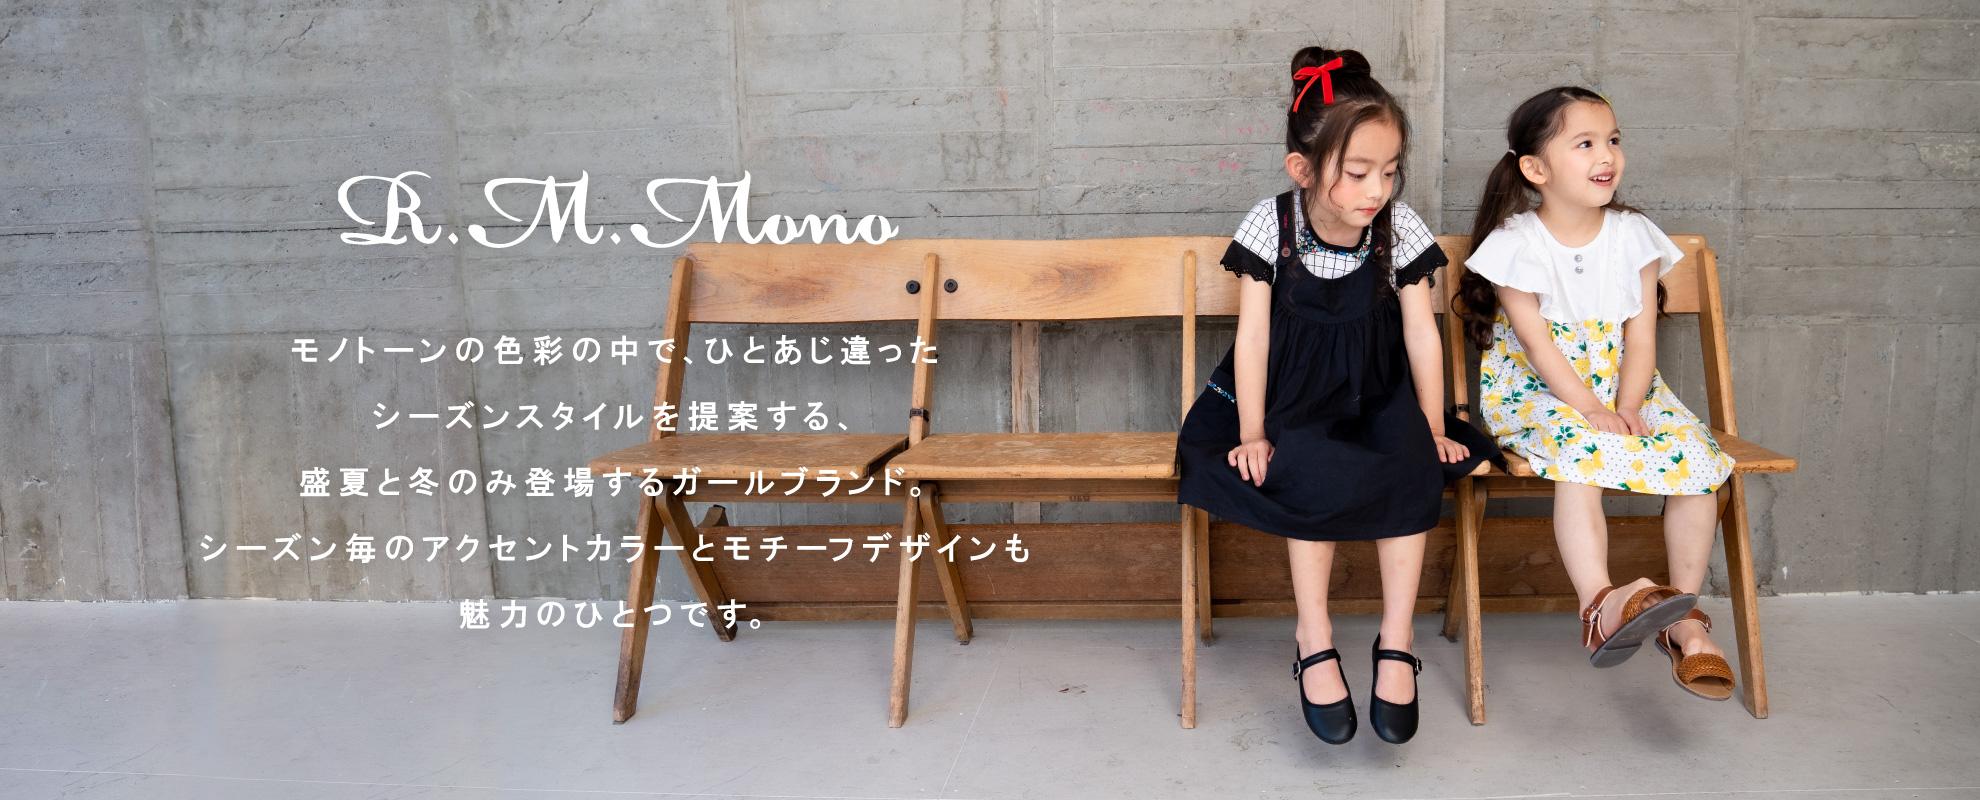 BOY's item